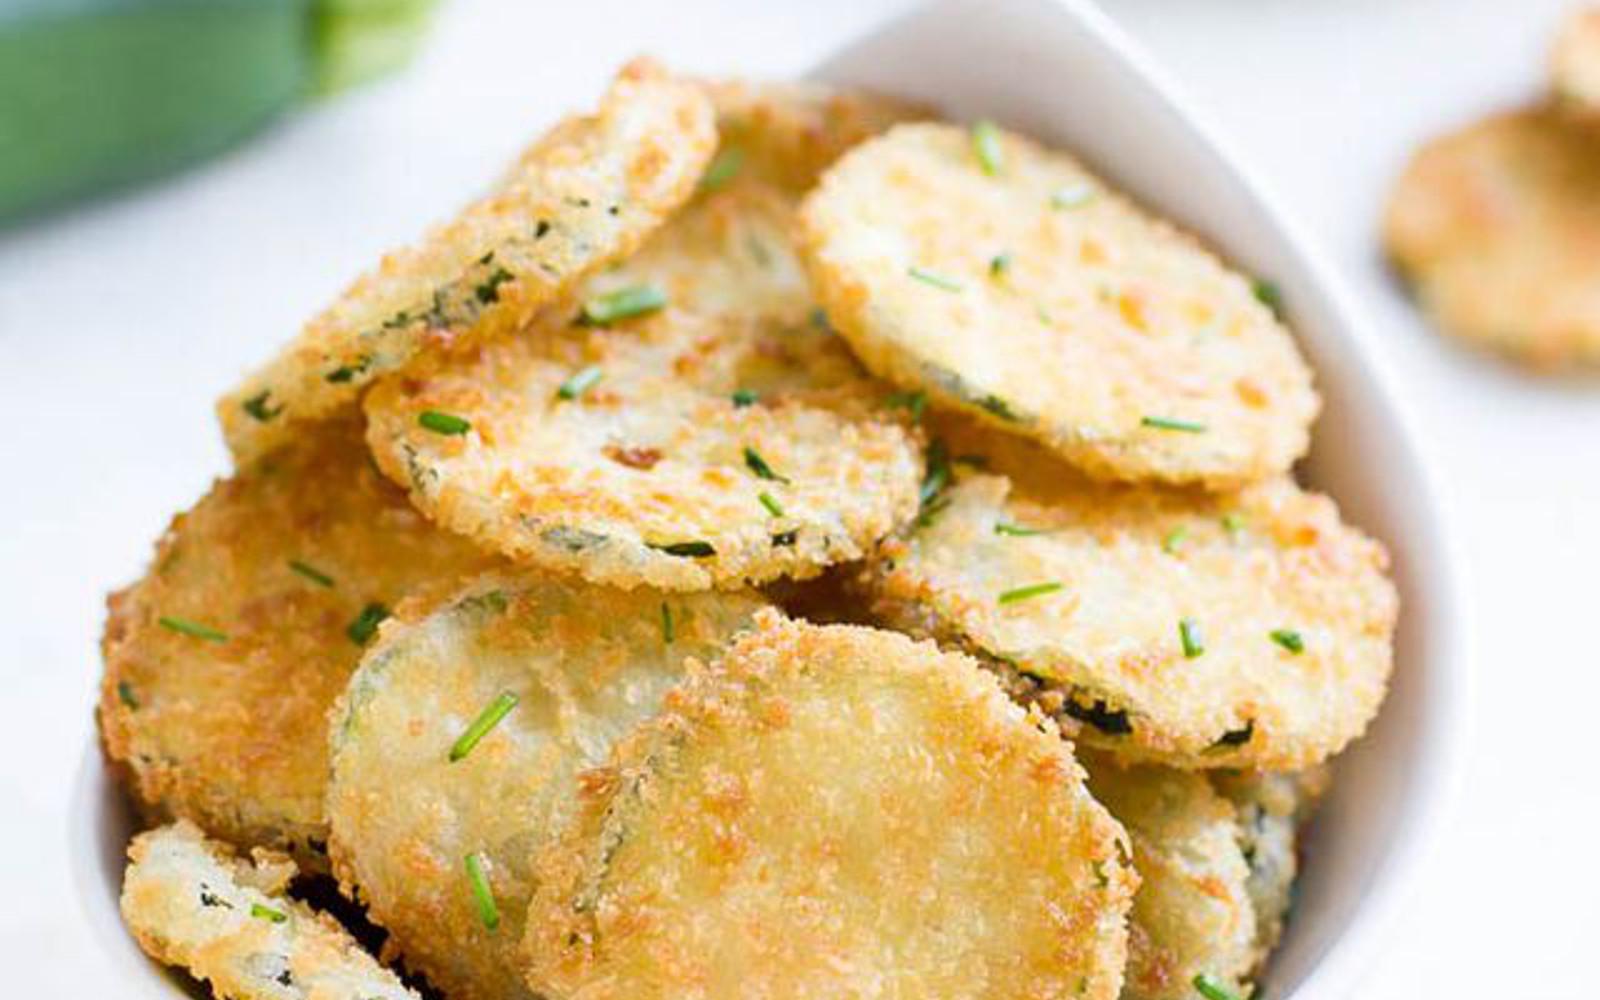 Panko-Crusted Zucchini Chips